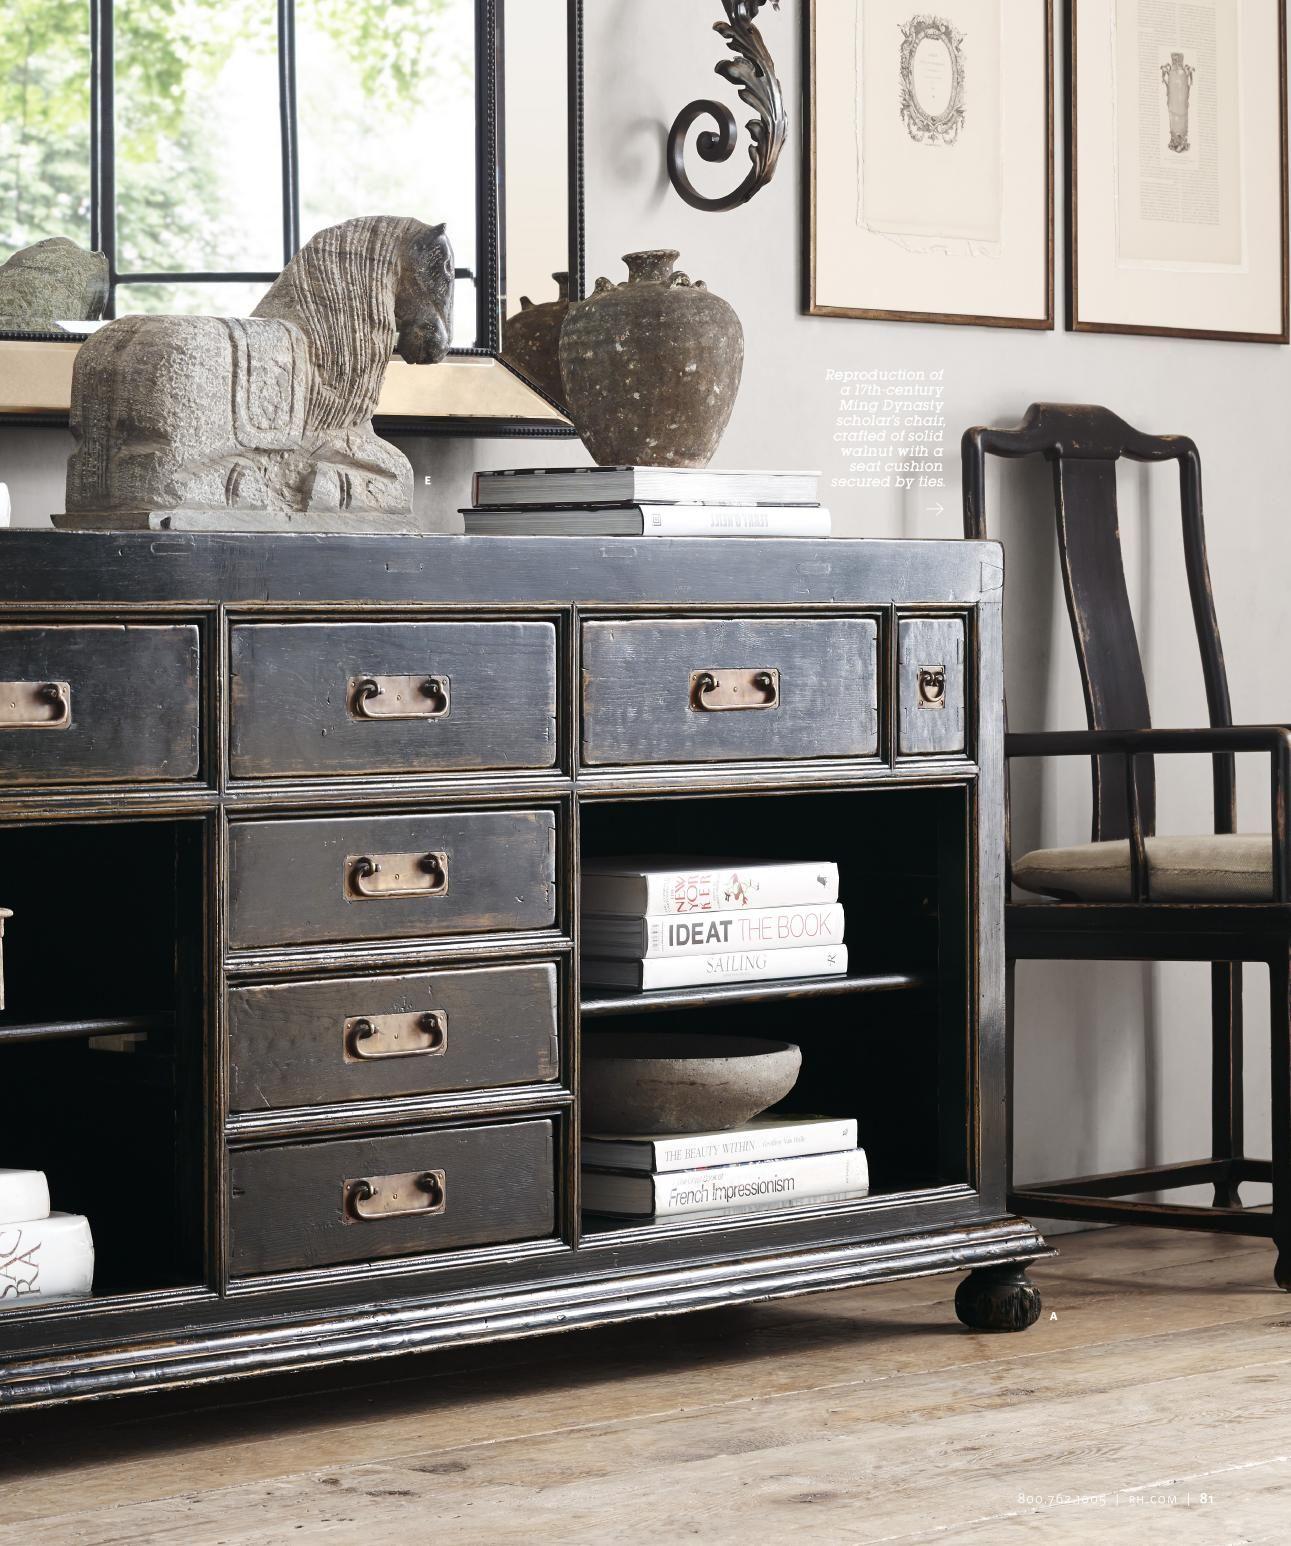 Rh Source Books Barn Living Restoration Hardware New Homes Dresser Dining Room